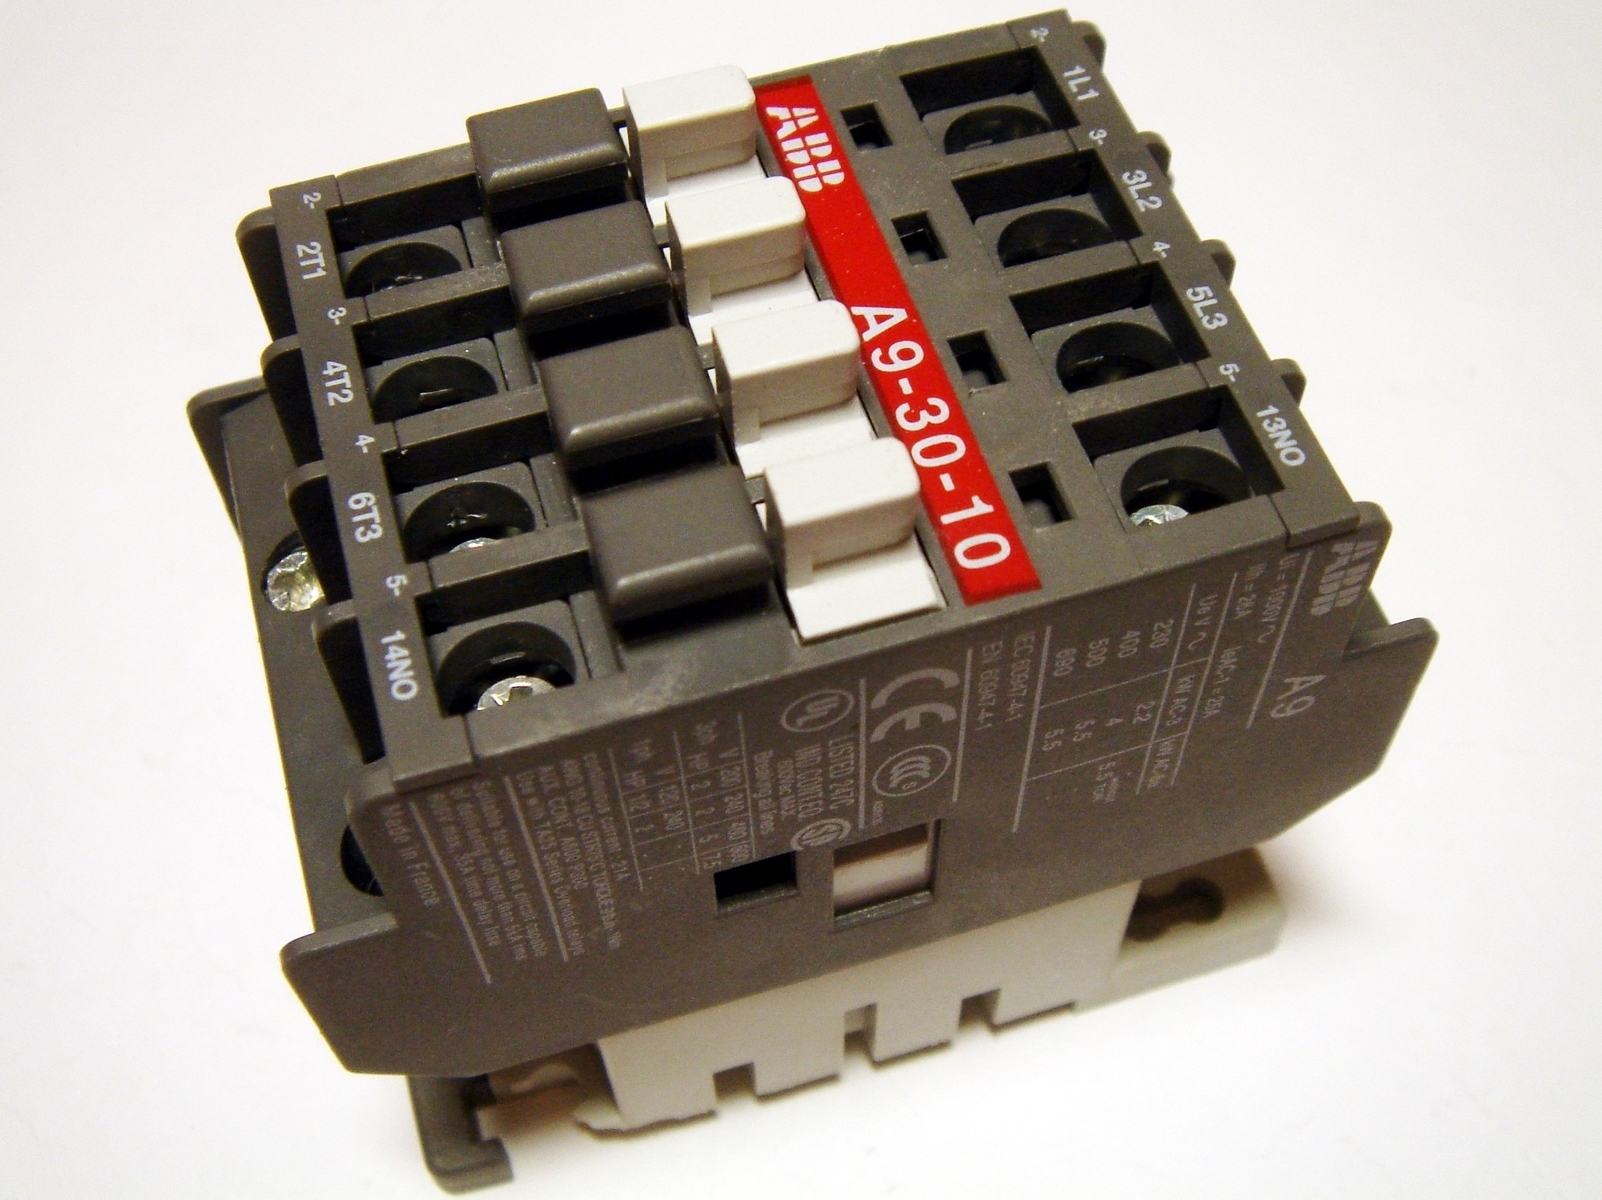 Kontaktor 3-faasiline 25A(16kW), A9-30-10, ABB, 1SBL141001R8010